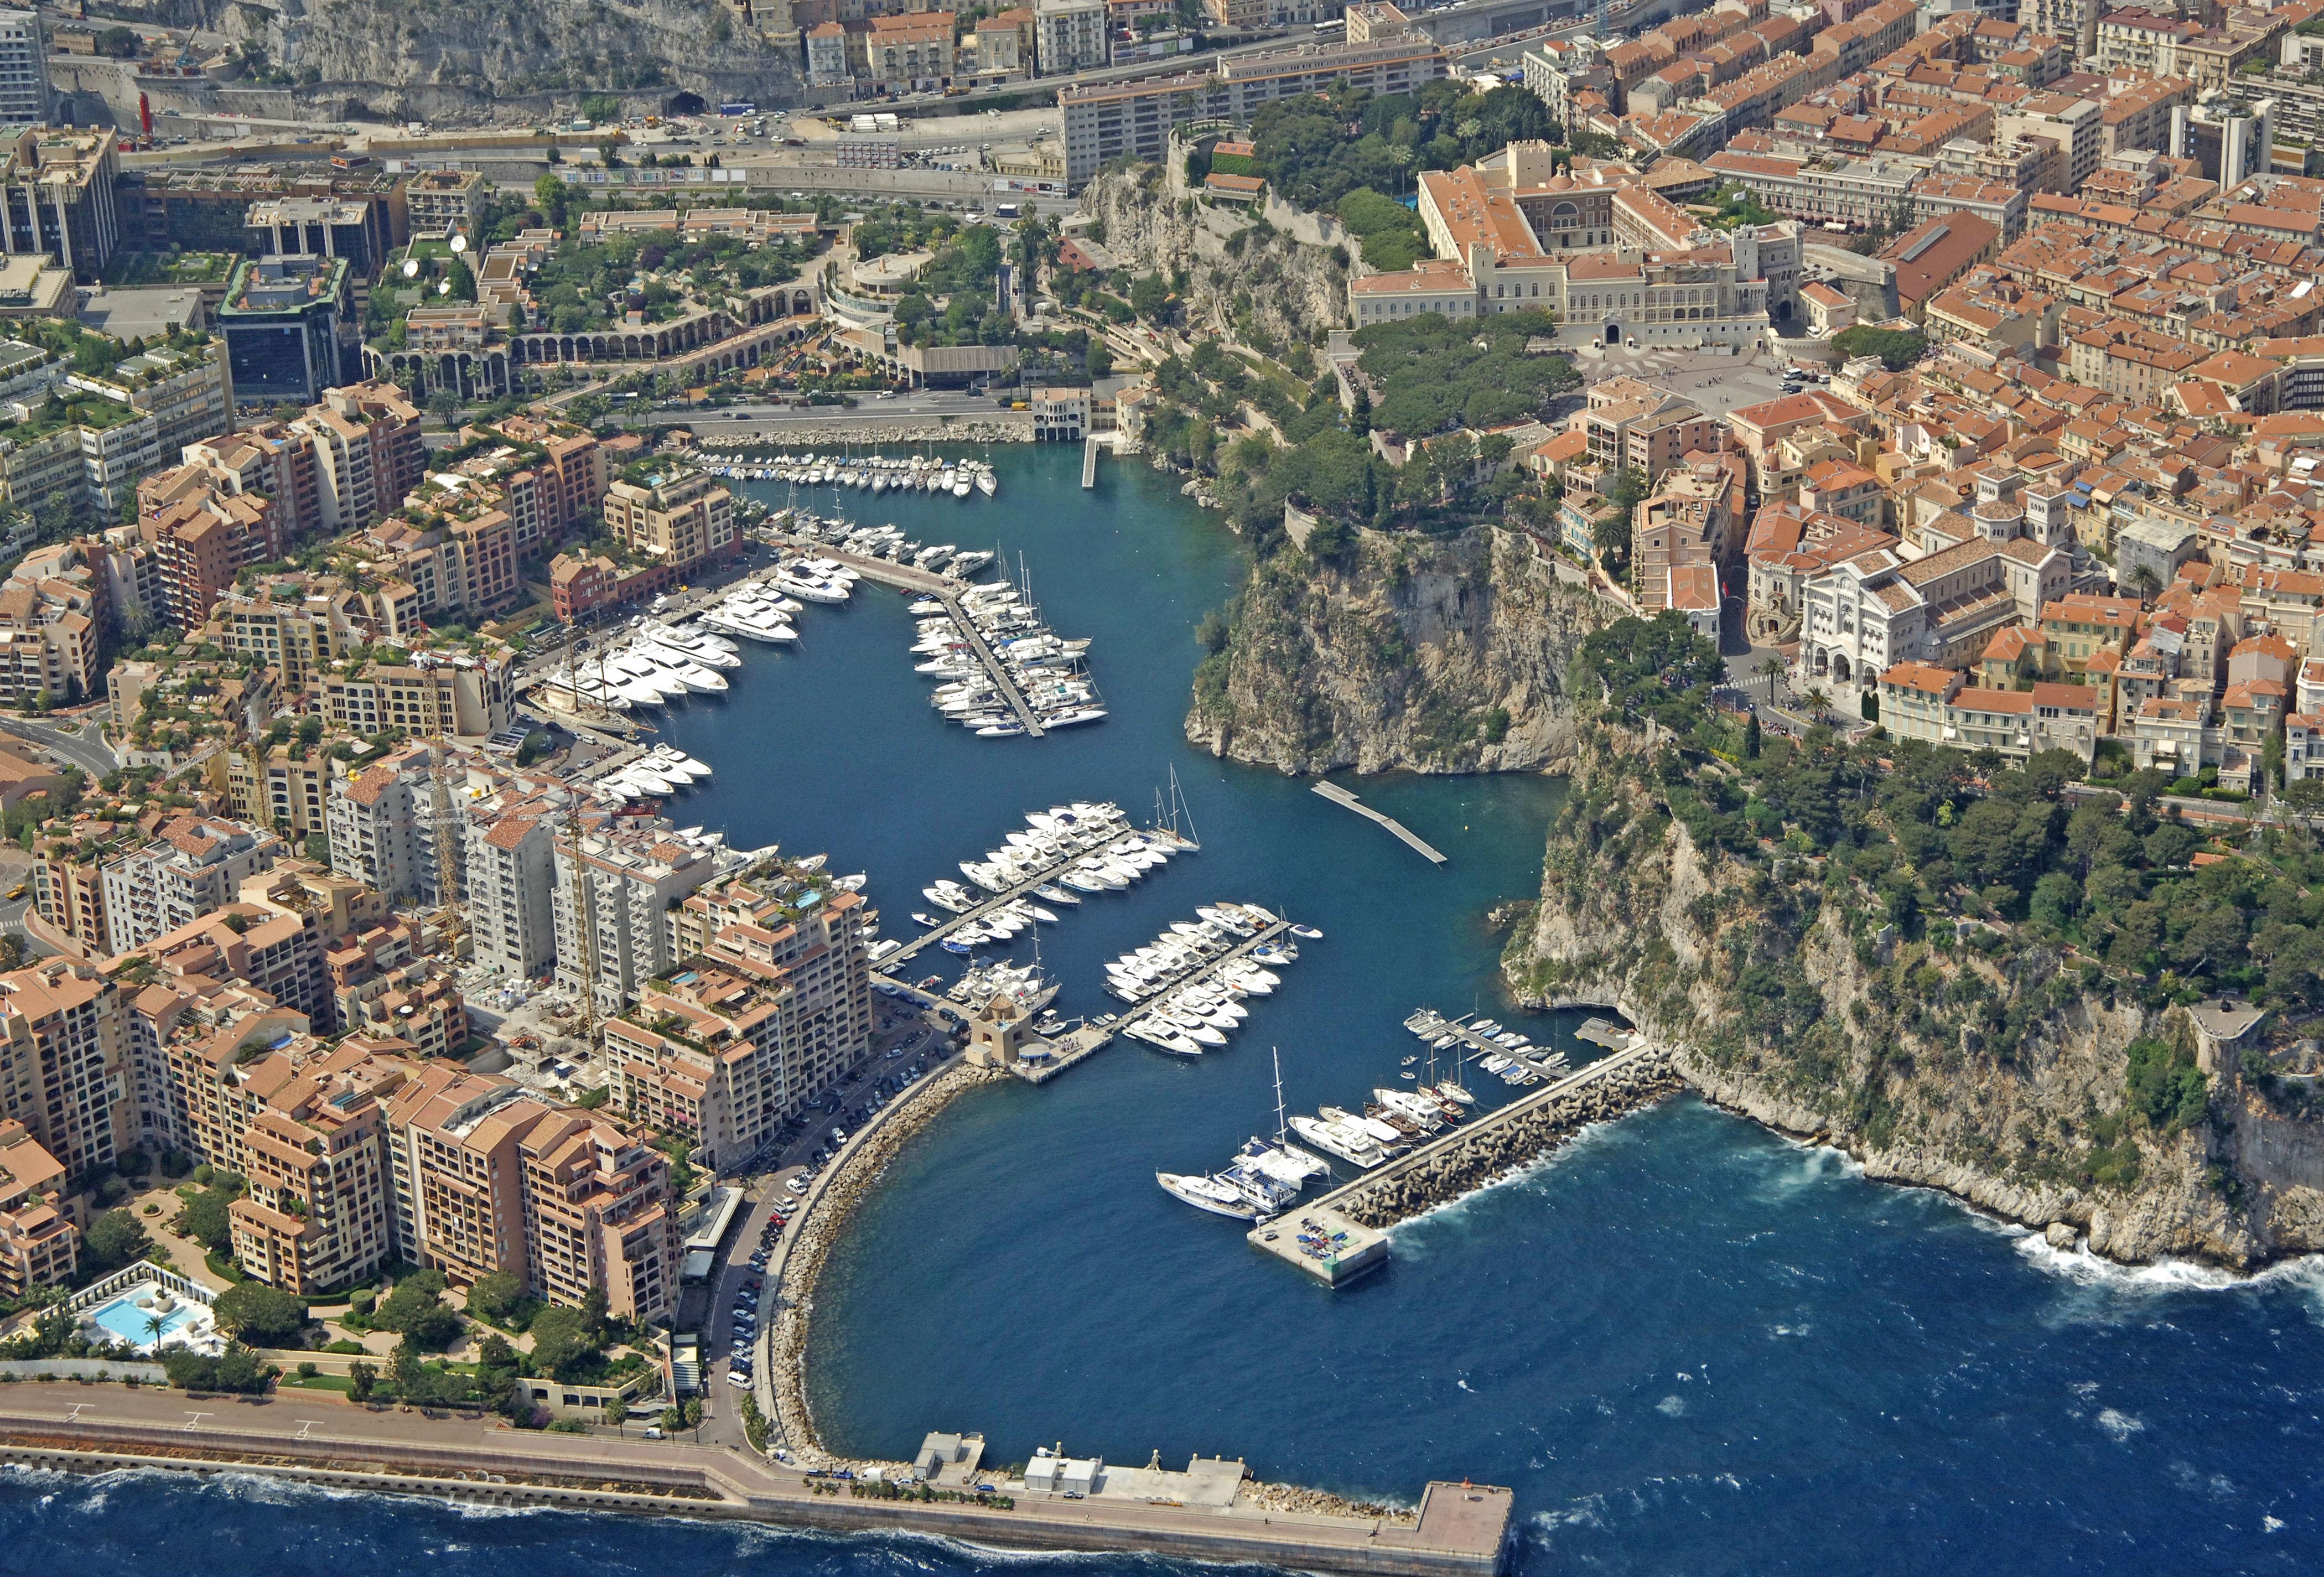 Monaco Port De Fontvieille Marina in Cap D'Ail, Provence-Alpes-Cote D'Azur, France - Marina ...